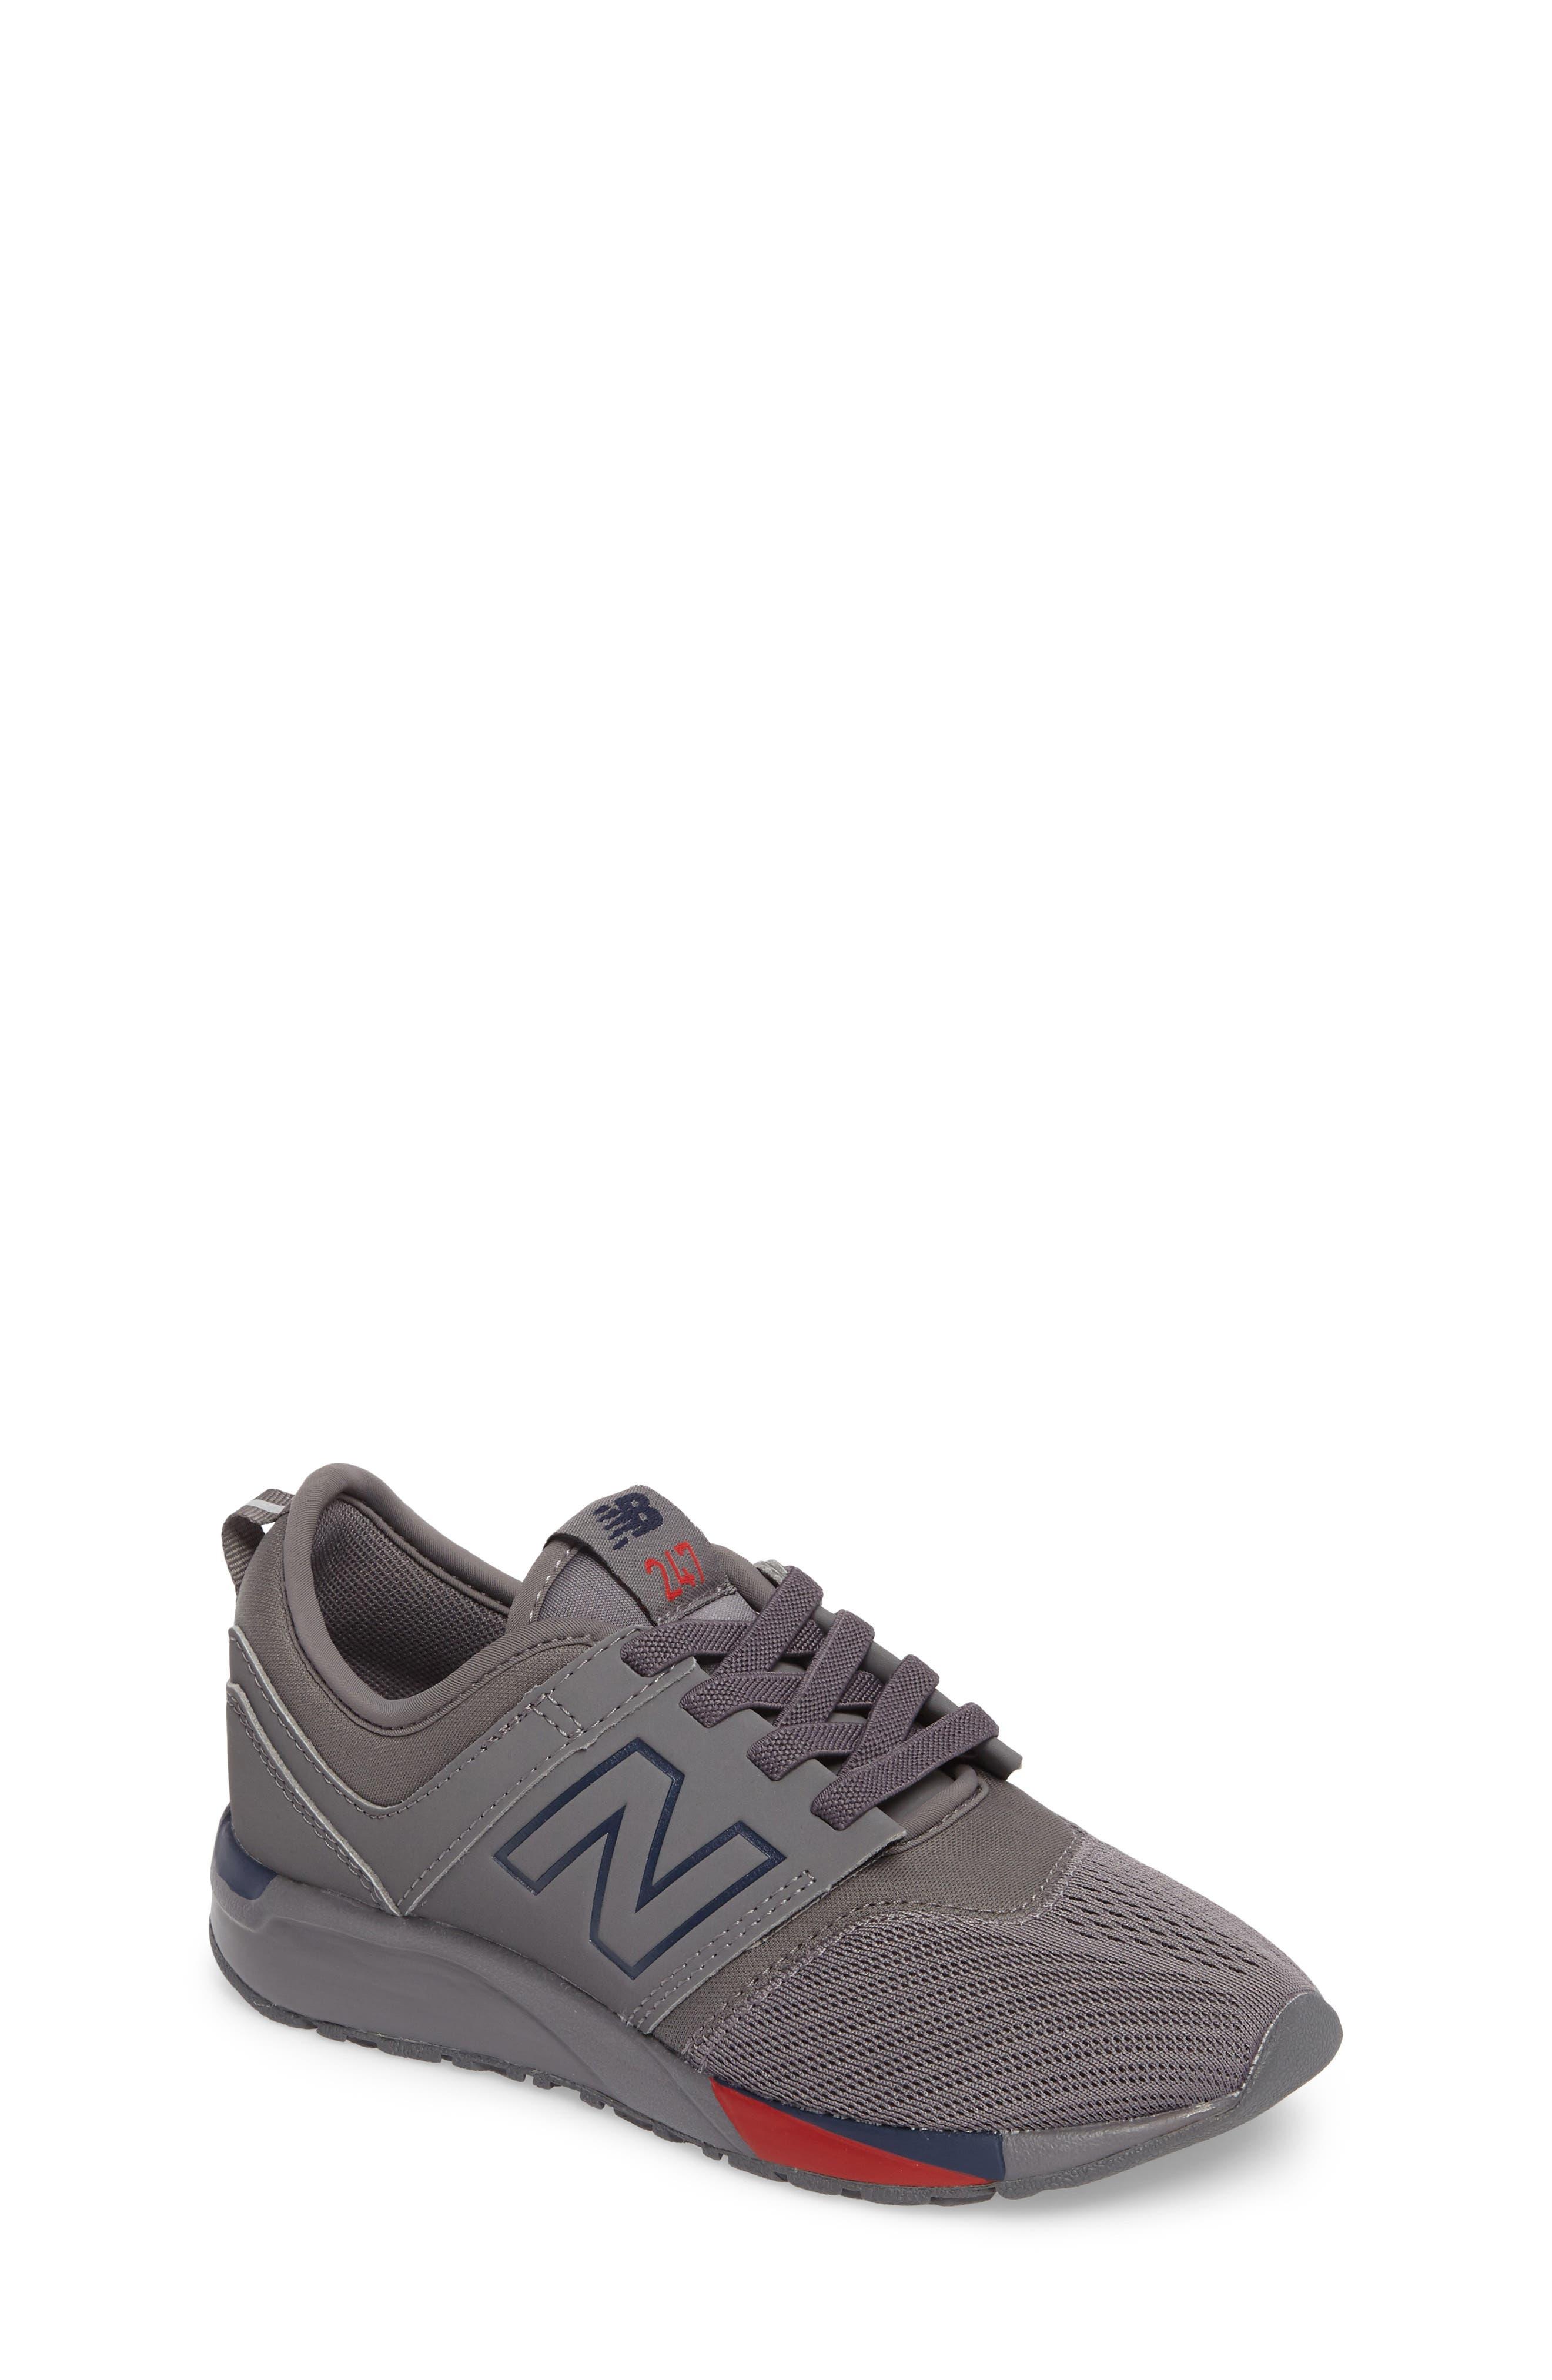 New Balance 247 Sport Sneaker (Baby, Walker, Toddler, Little Kid & Big Kid)